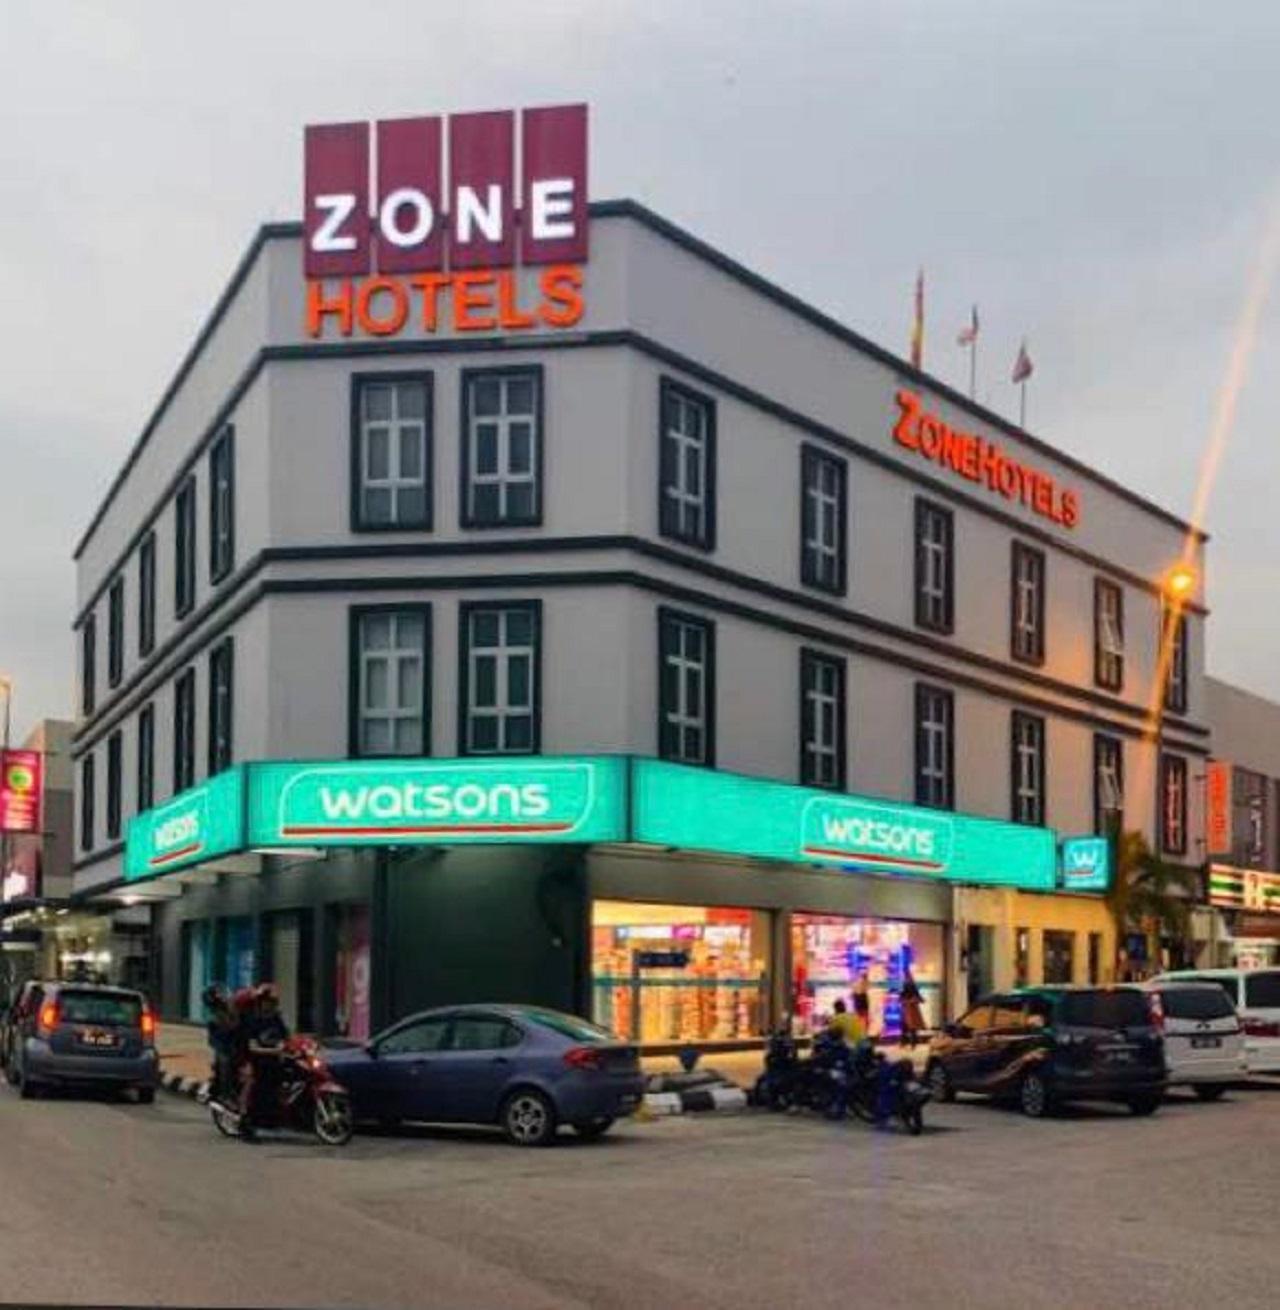 ZONE Hotels